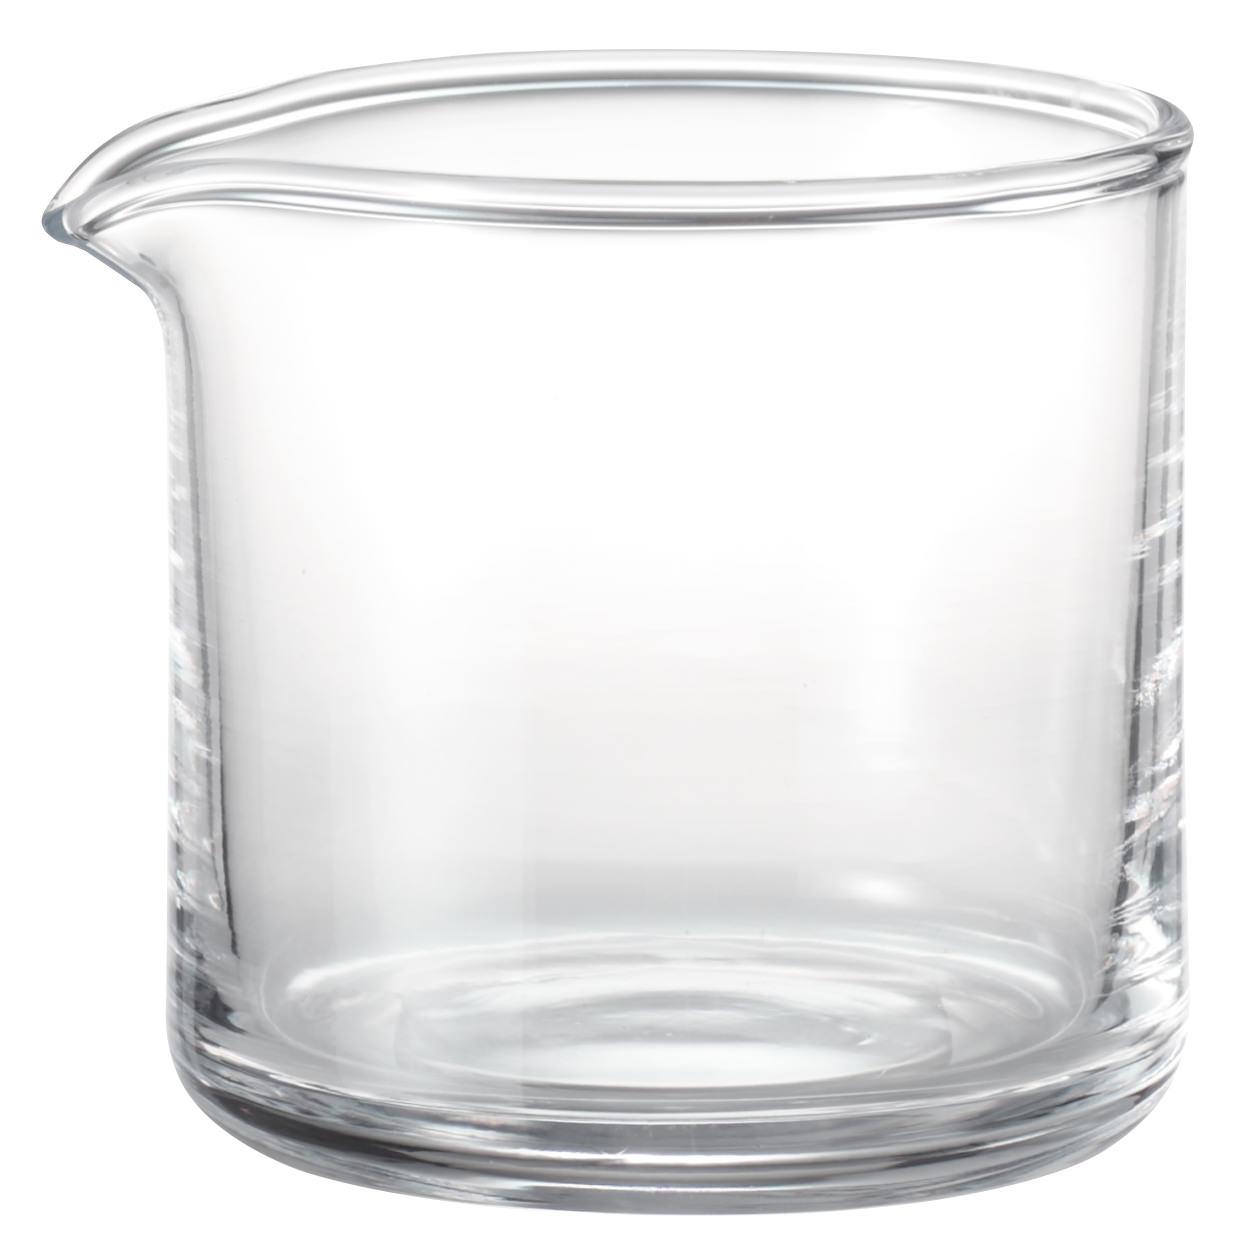 RoomClip商品情報 - ソーダガラス クリーマー